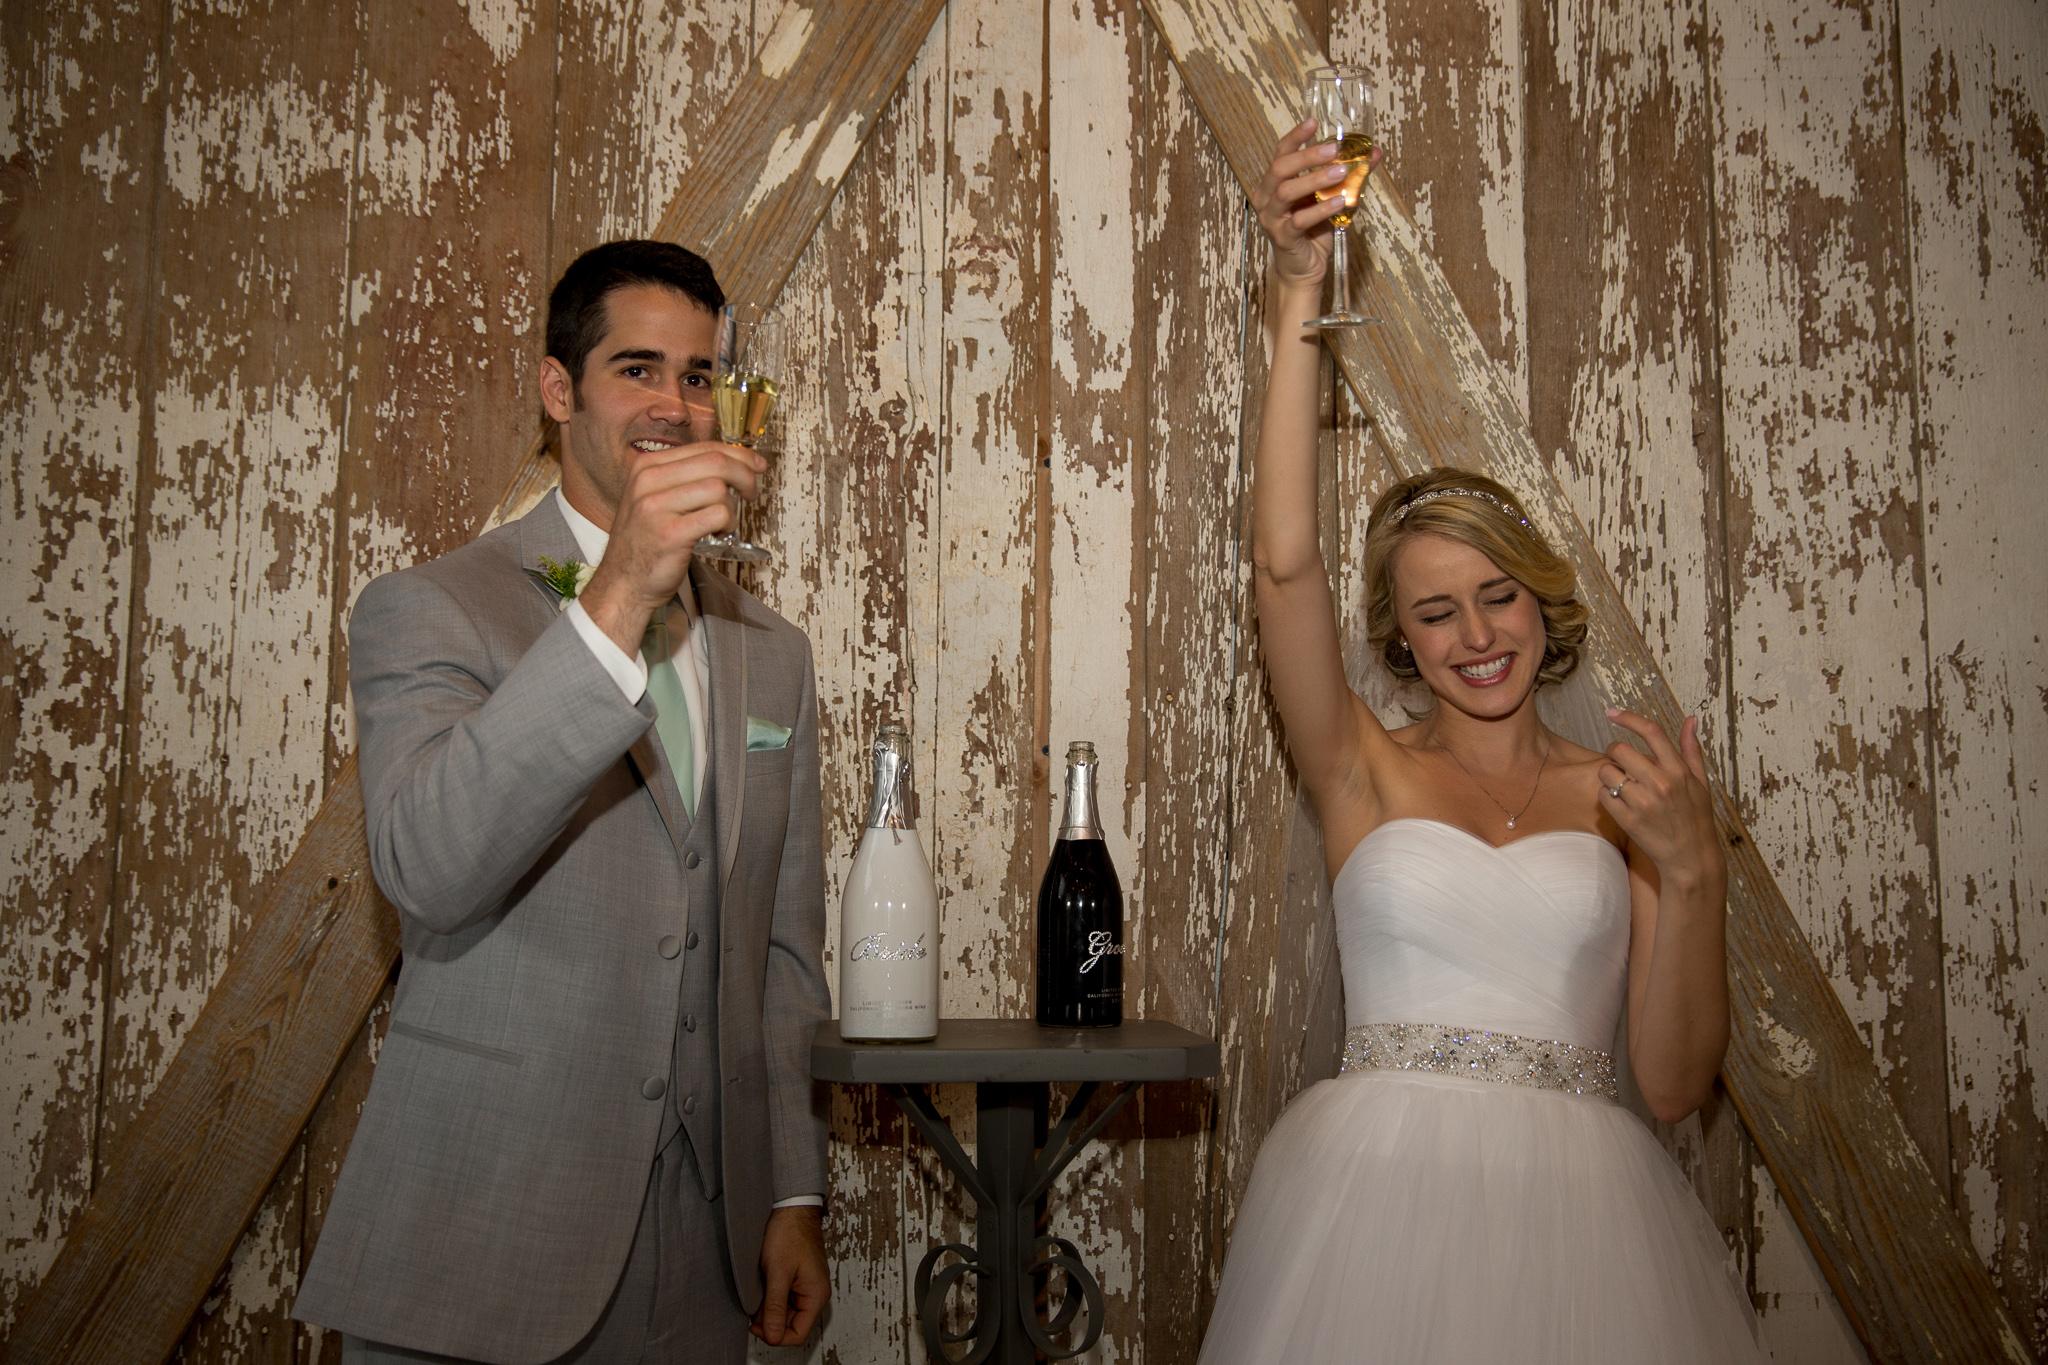 Wedding_Day_Moments_To_Do_List_1Z4B6489.jpg